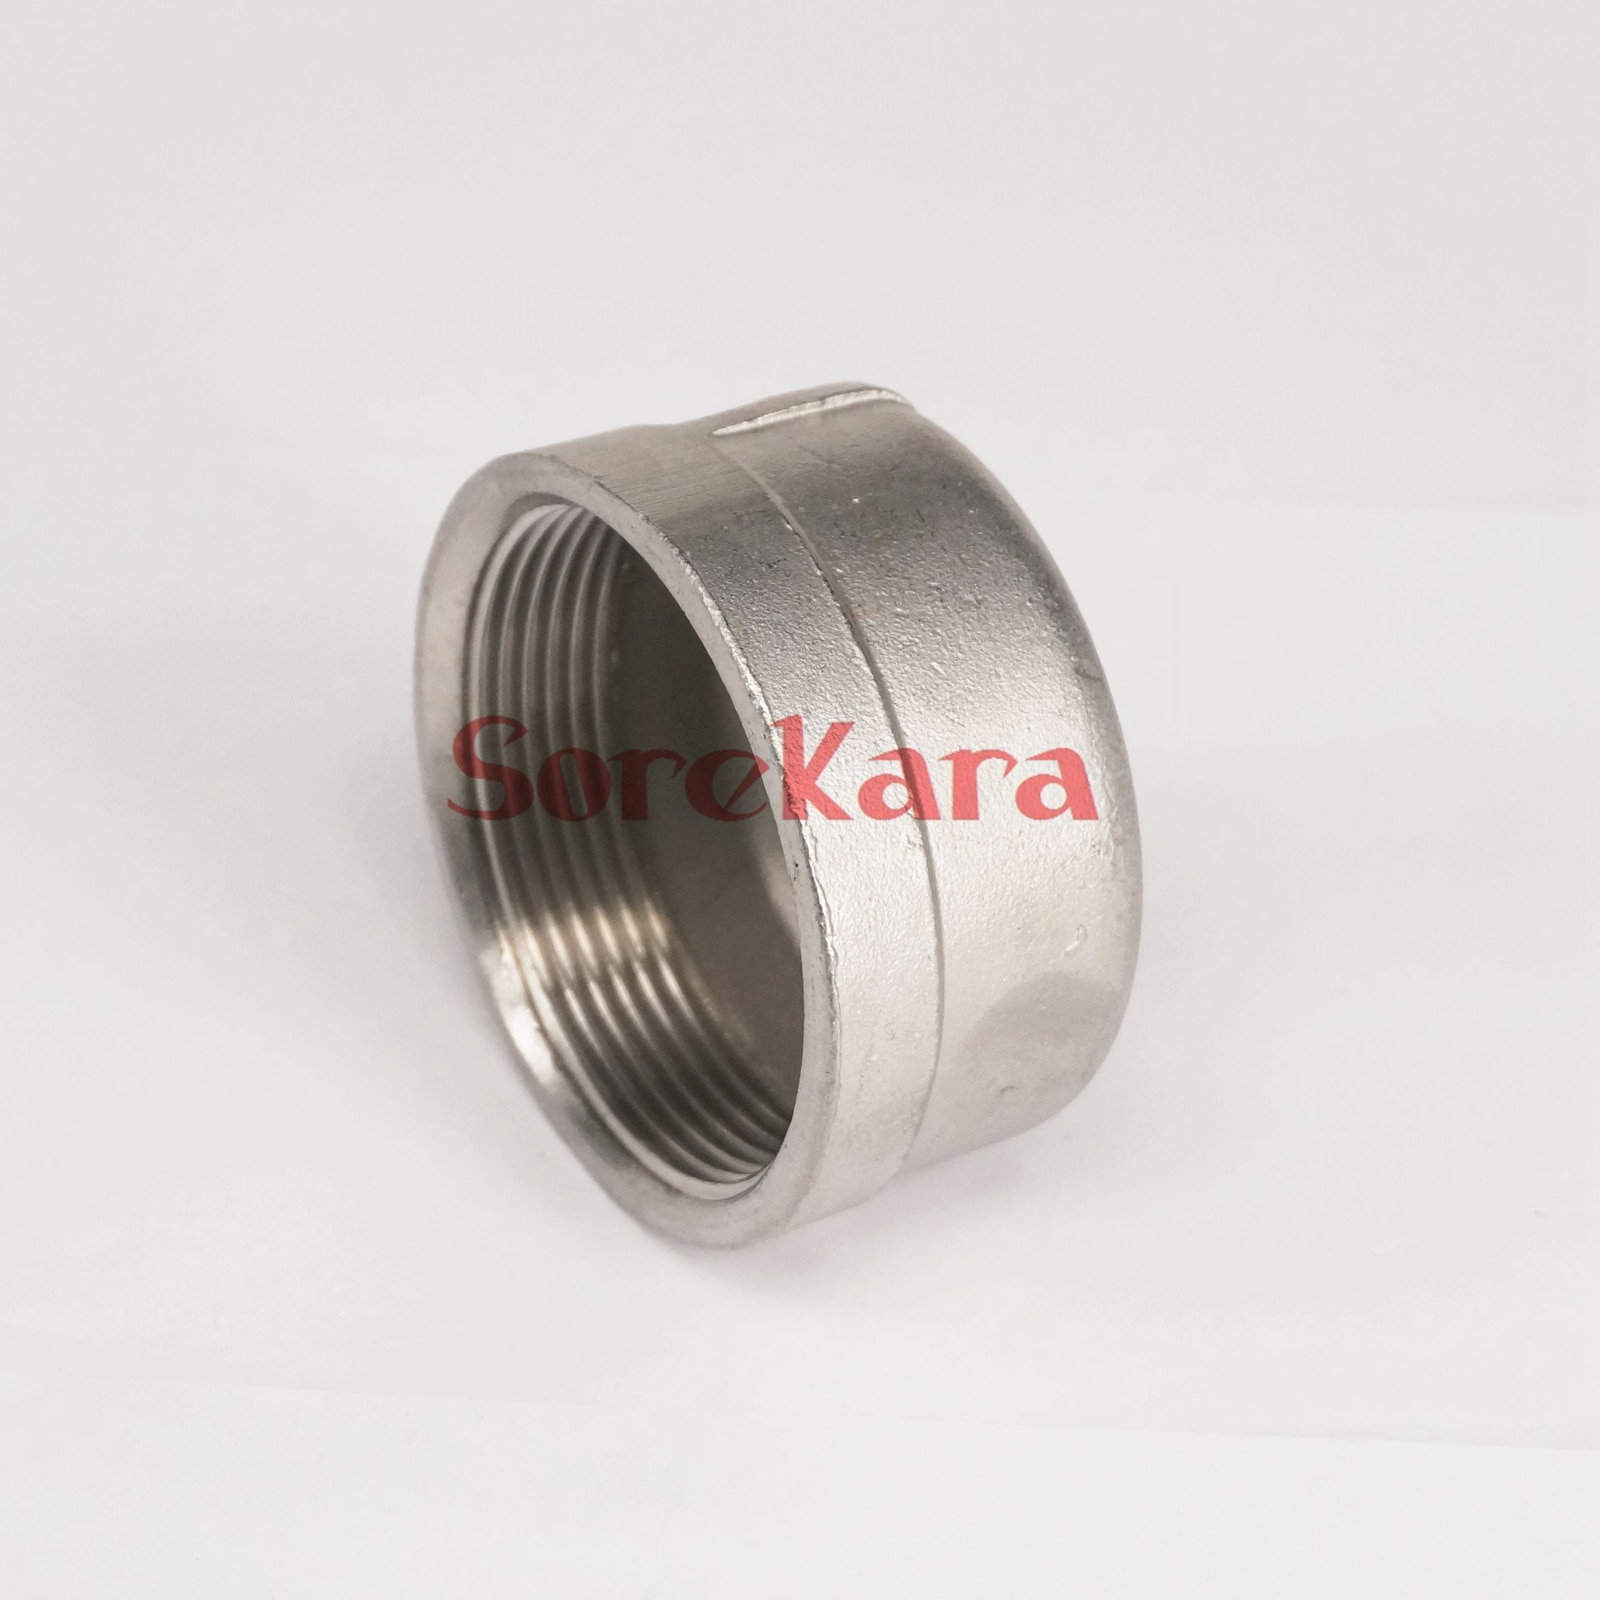 "2 ""BSP hilo femenino 304 de acero inoxidable de tubería tapón avellanado ronda toma para Cabezal de presión 2,5 Mpa"